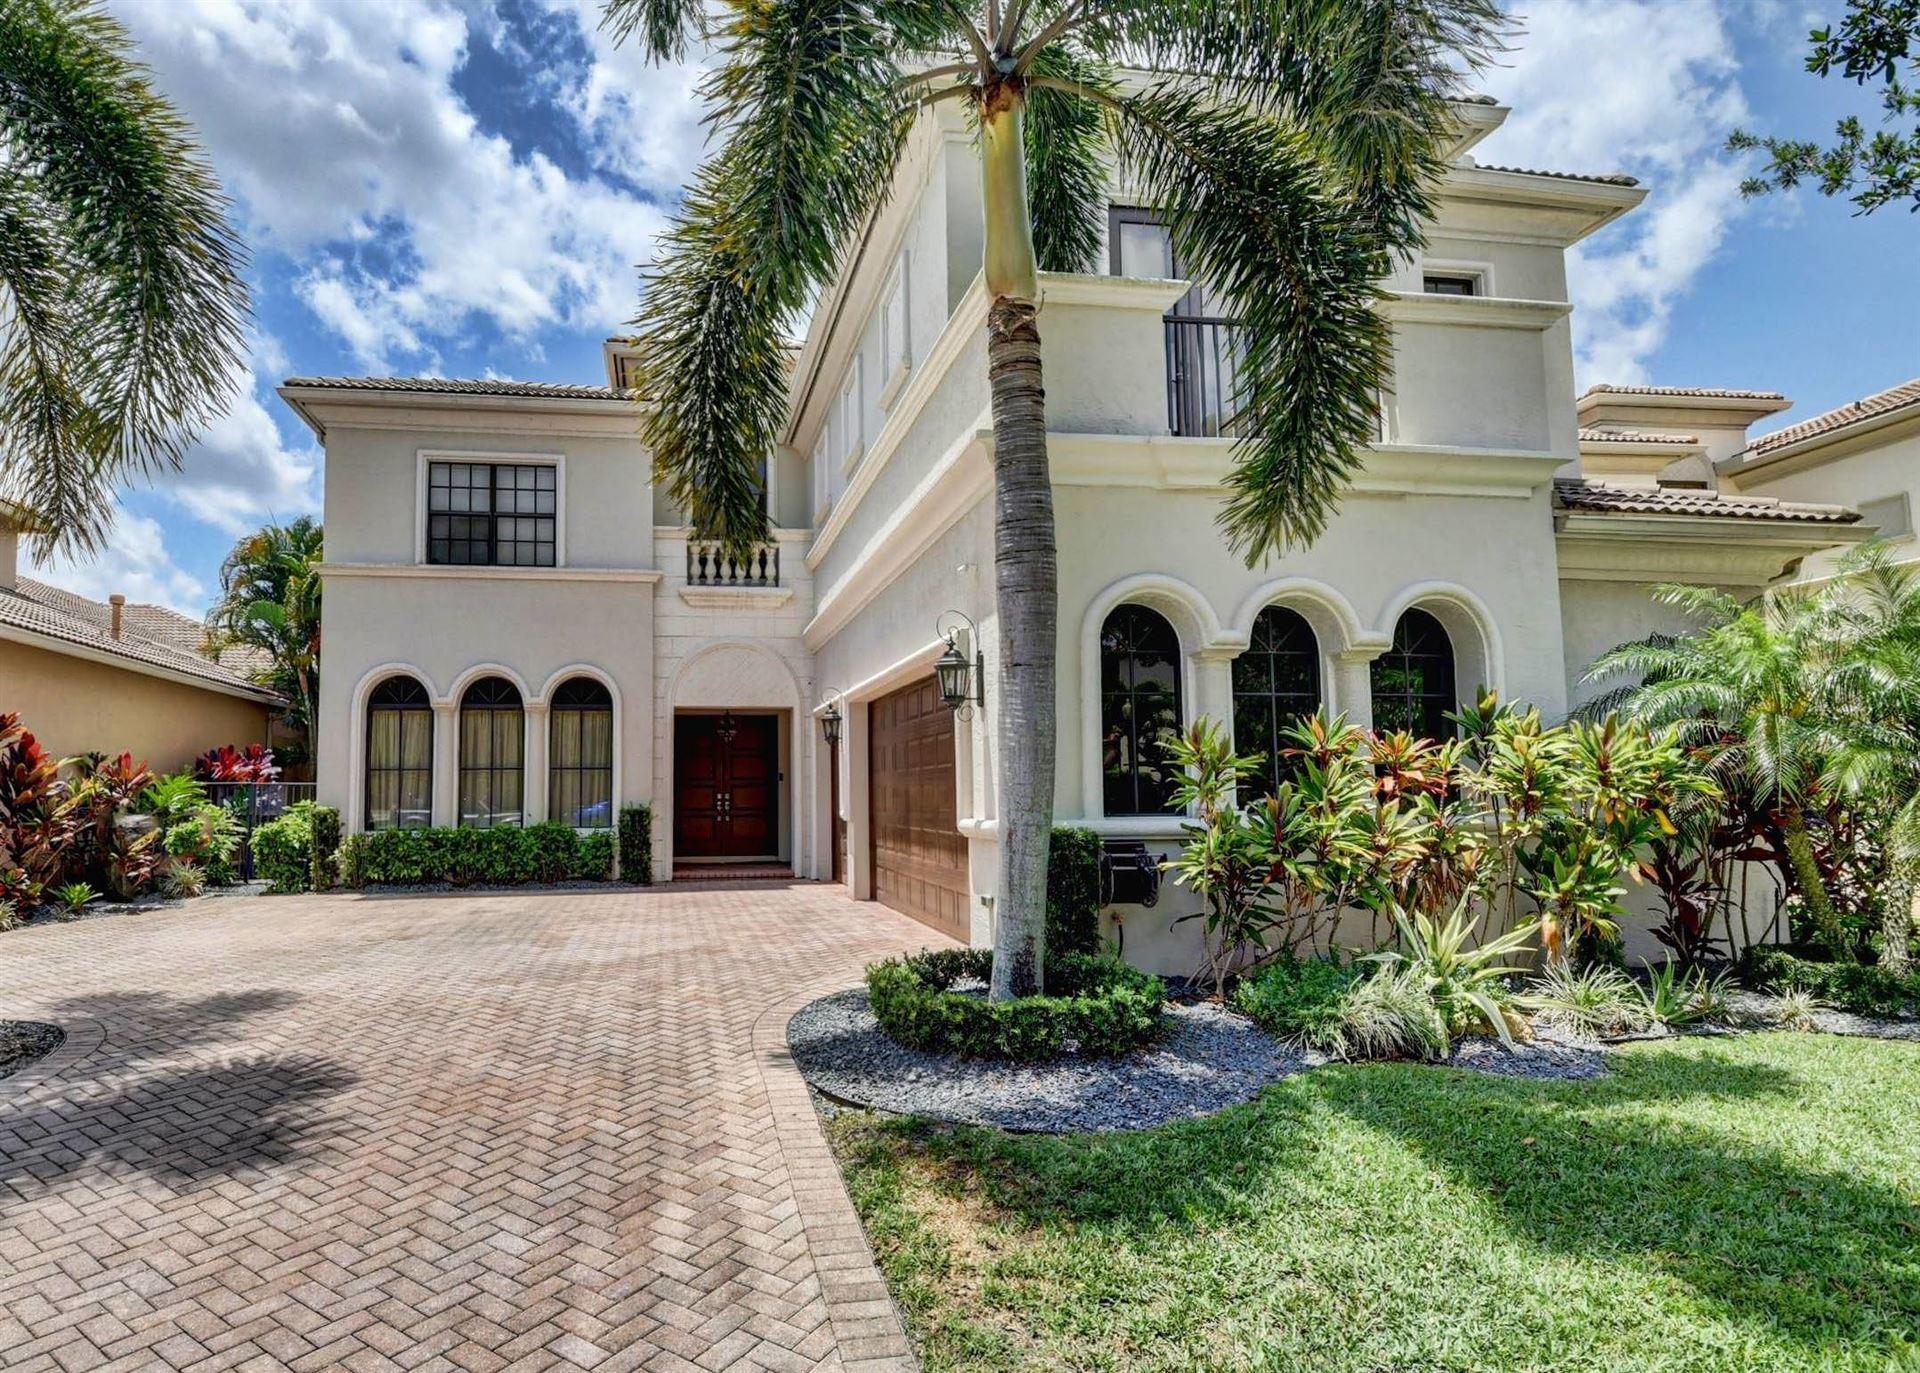 17827 Lake Azure Way, Boca Raton, FL 33496 - MLS#: RX-10711410